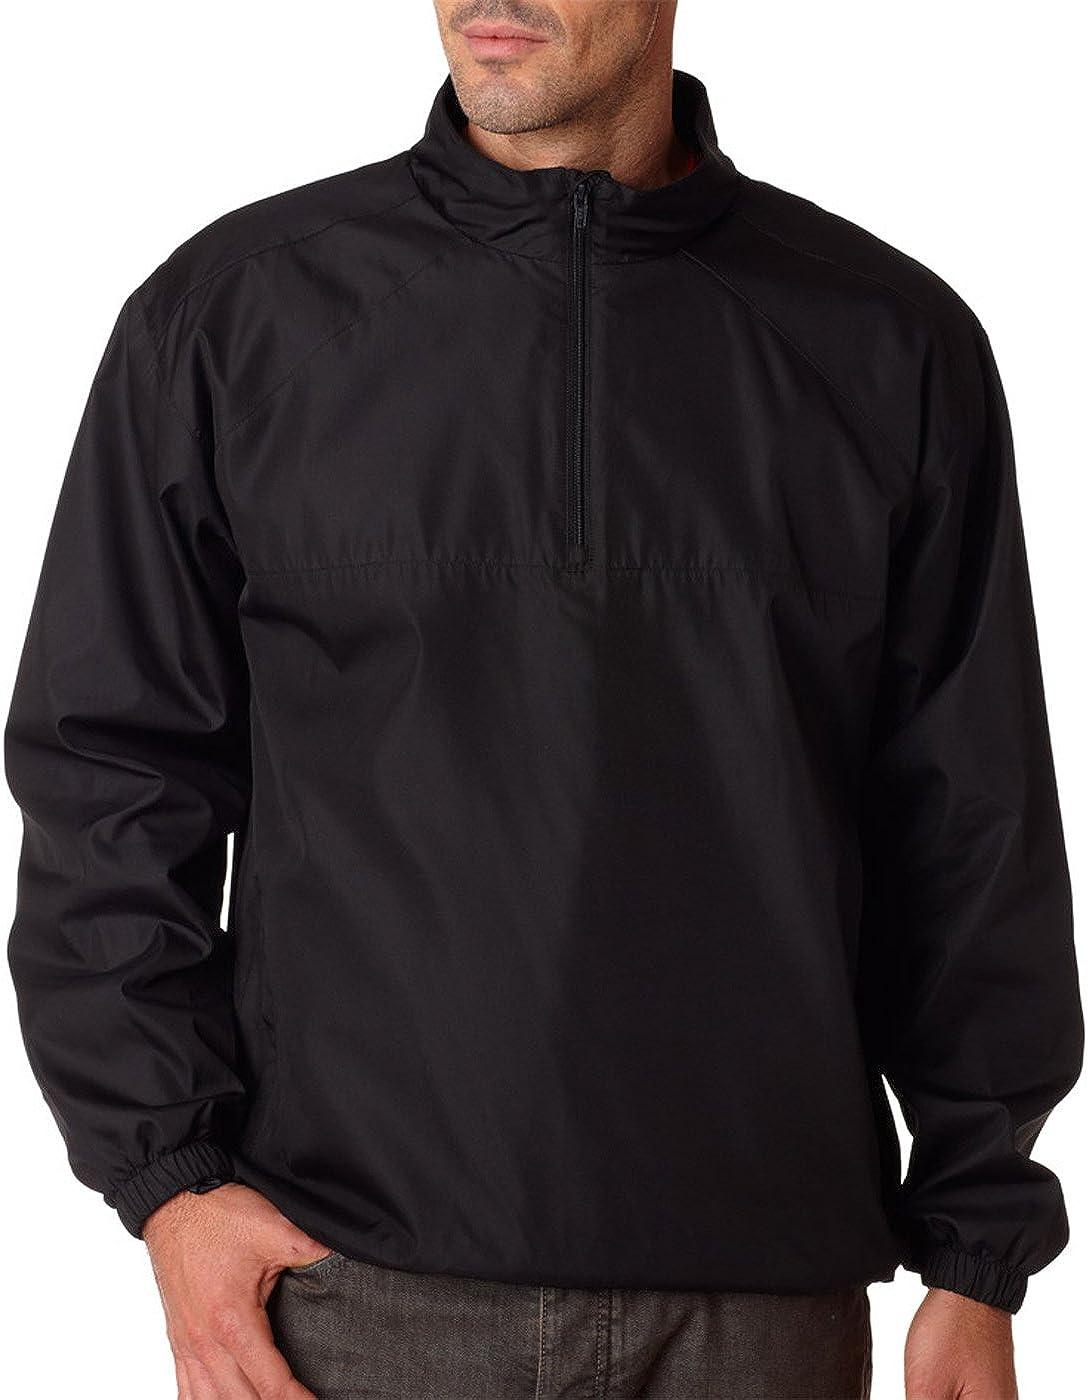 RETOV Men's Micro-Poly 2021new shipping free shipping Windshirt Black Large Over item handling ☆